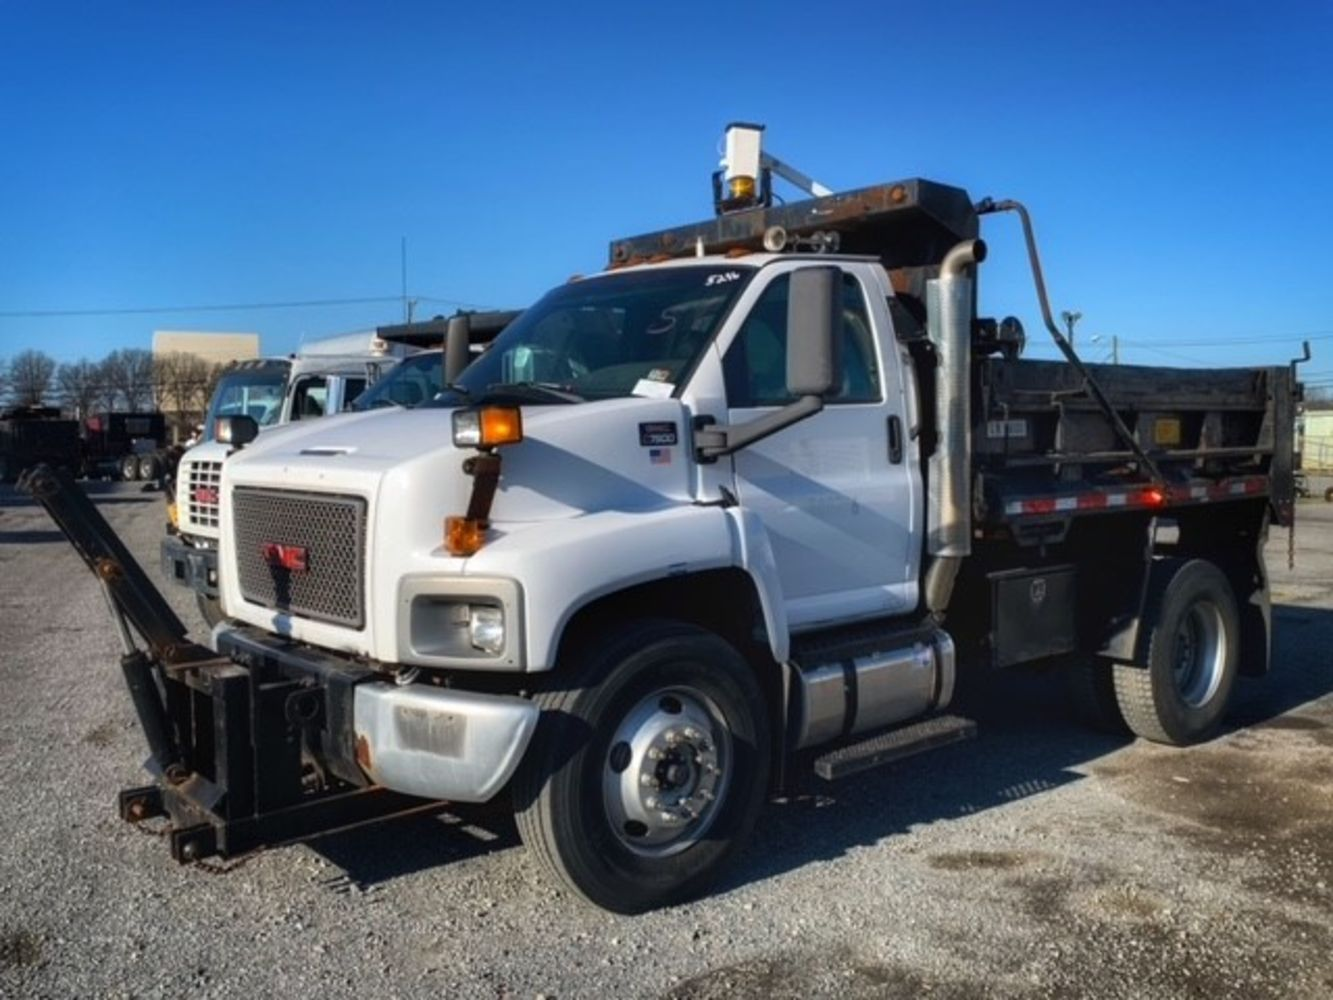 Construction Equipment & Trucks | Trucks, Trailers, Dozers, Tractors, Crawlers, & More! | Roanoke, VA | ONLINE AUCTION / LIVE VIRTUAL FORMAT